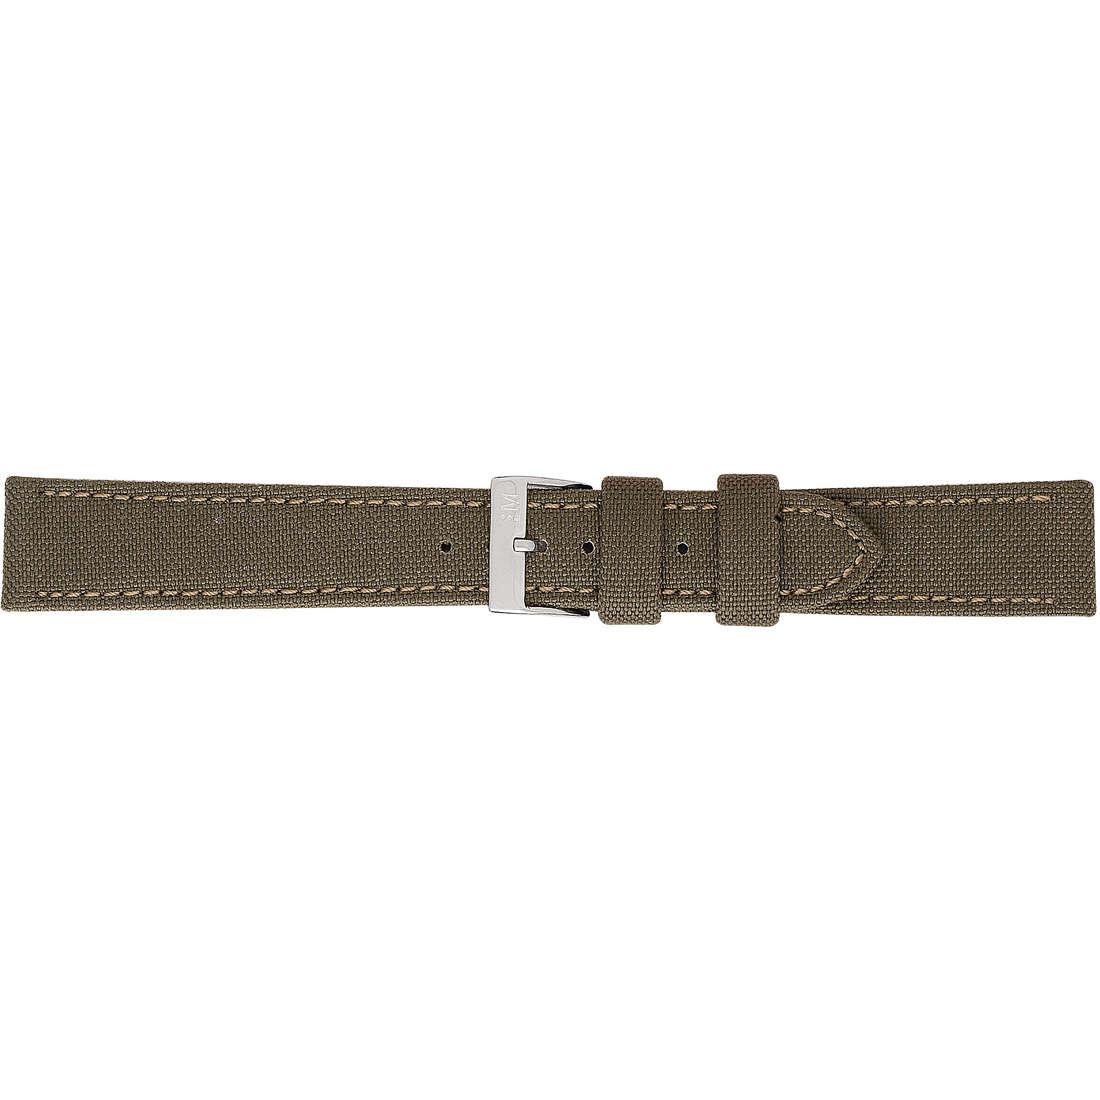 watch watch bands watch straps man Morellato Linea Sport A01U2779110072CR22